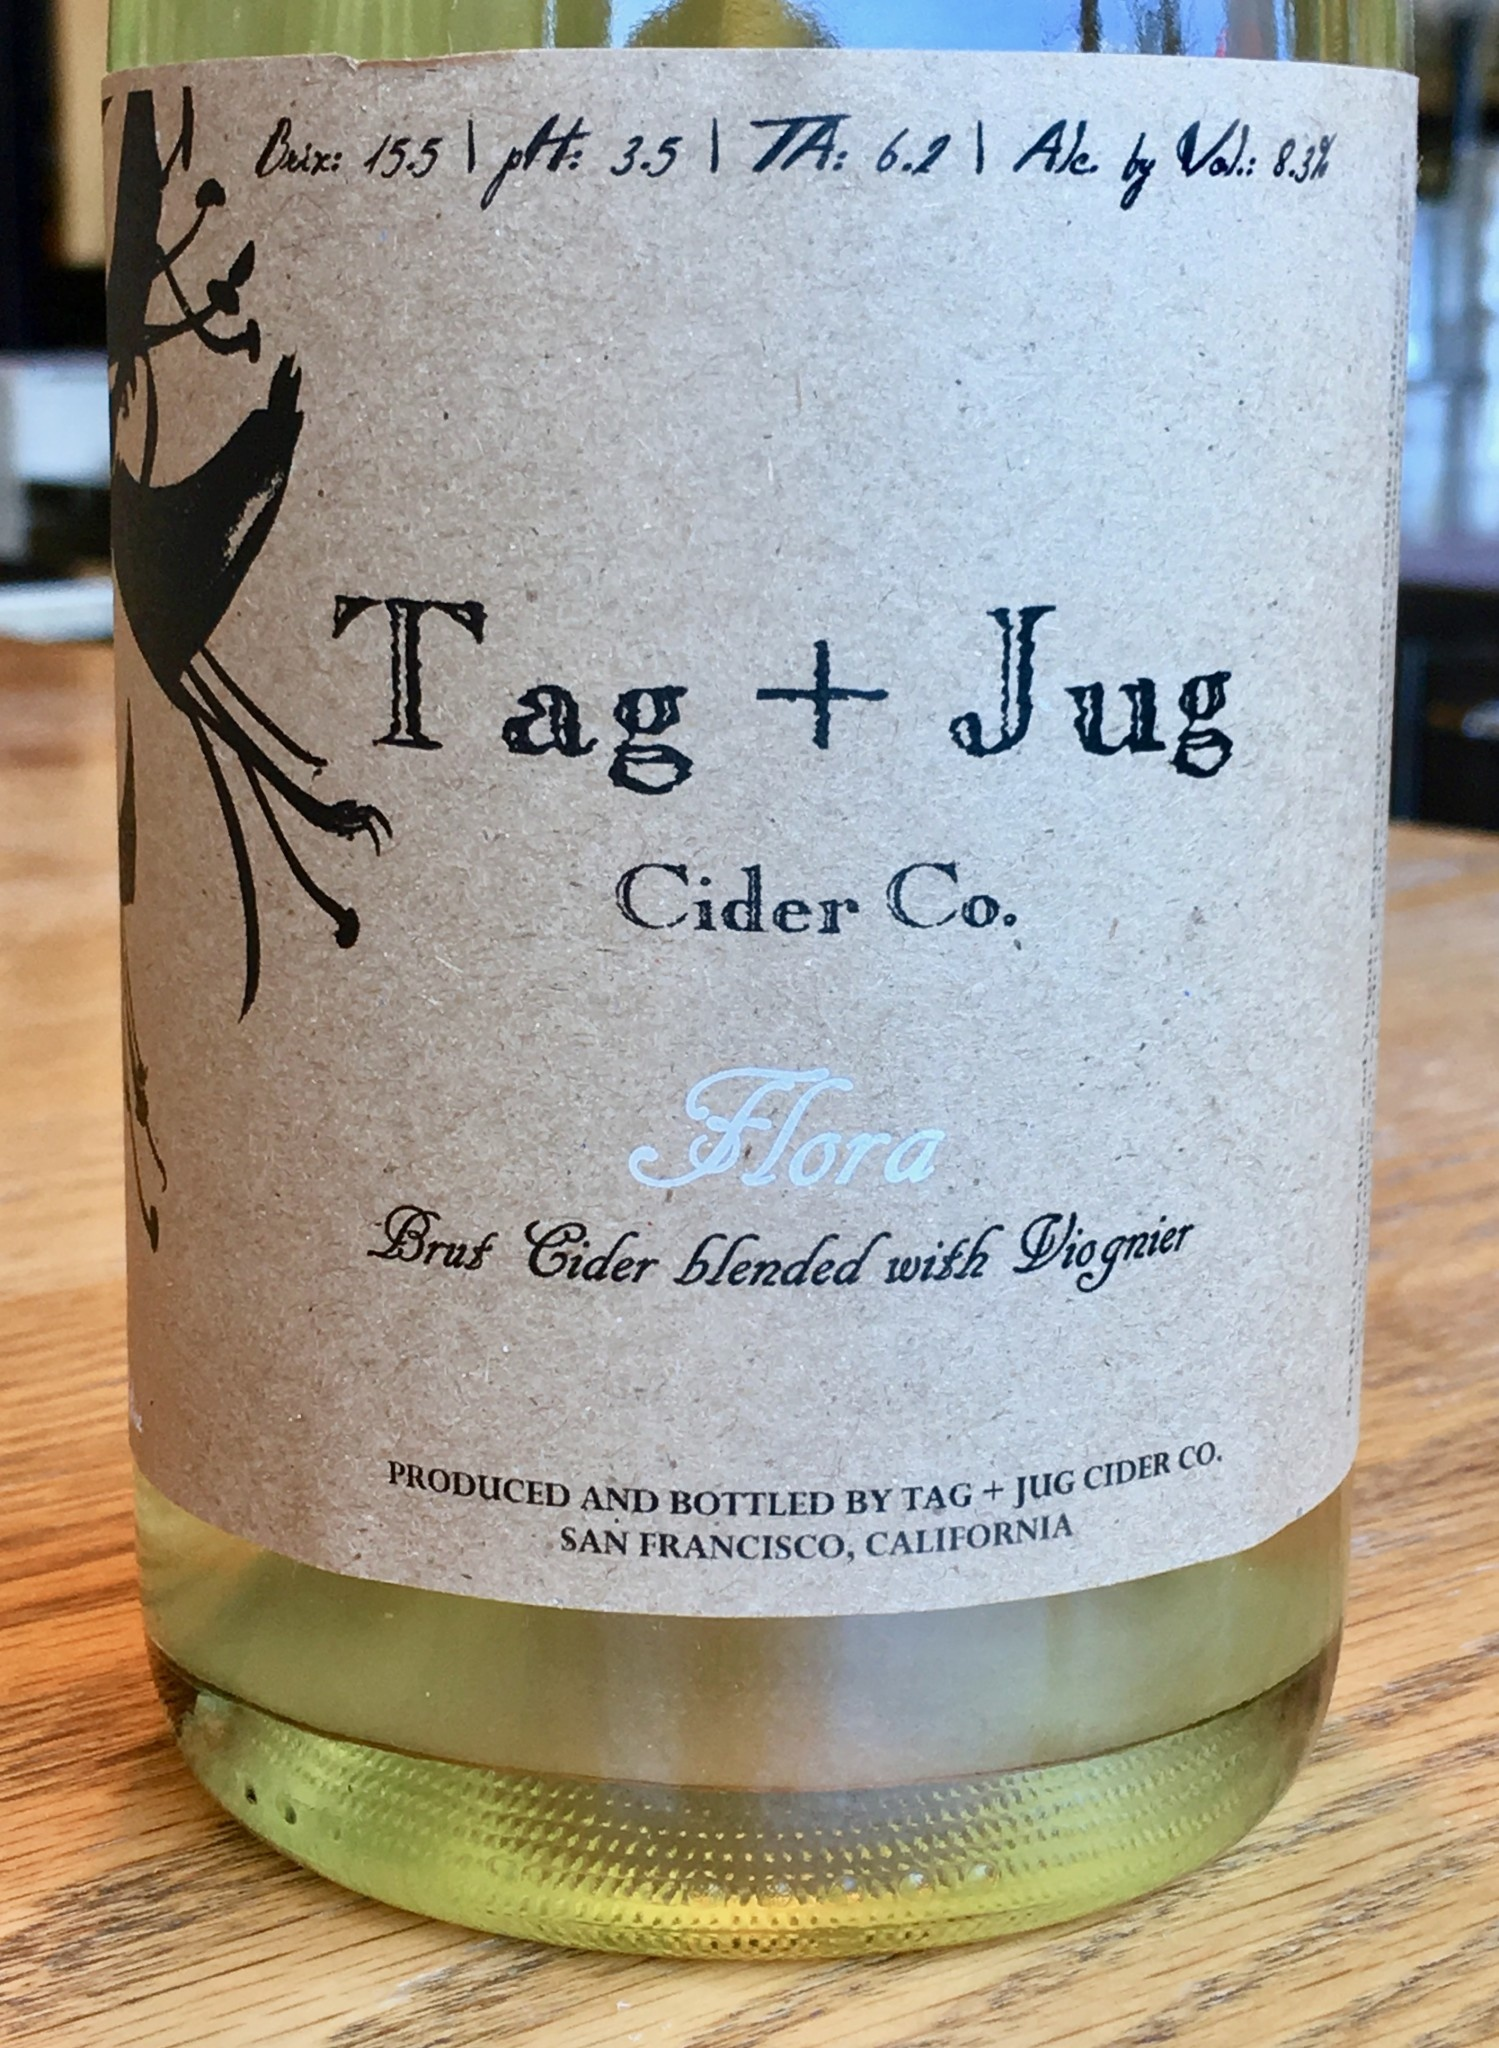 Conduit Tag + Jug Cider Flora 750ml